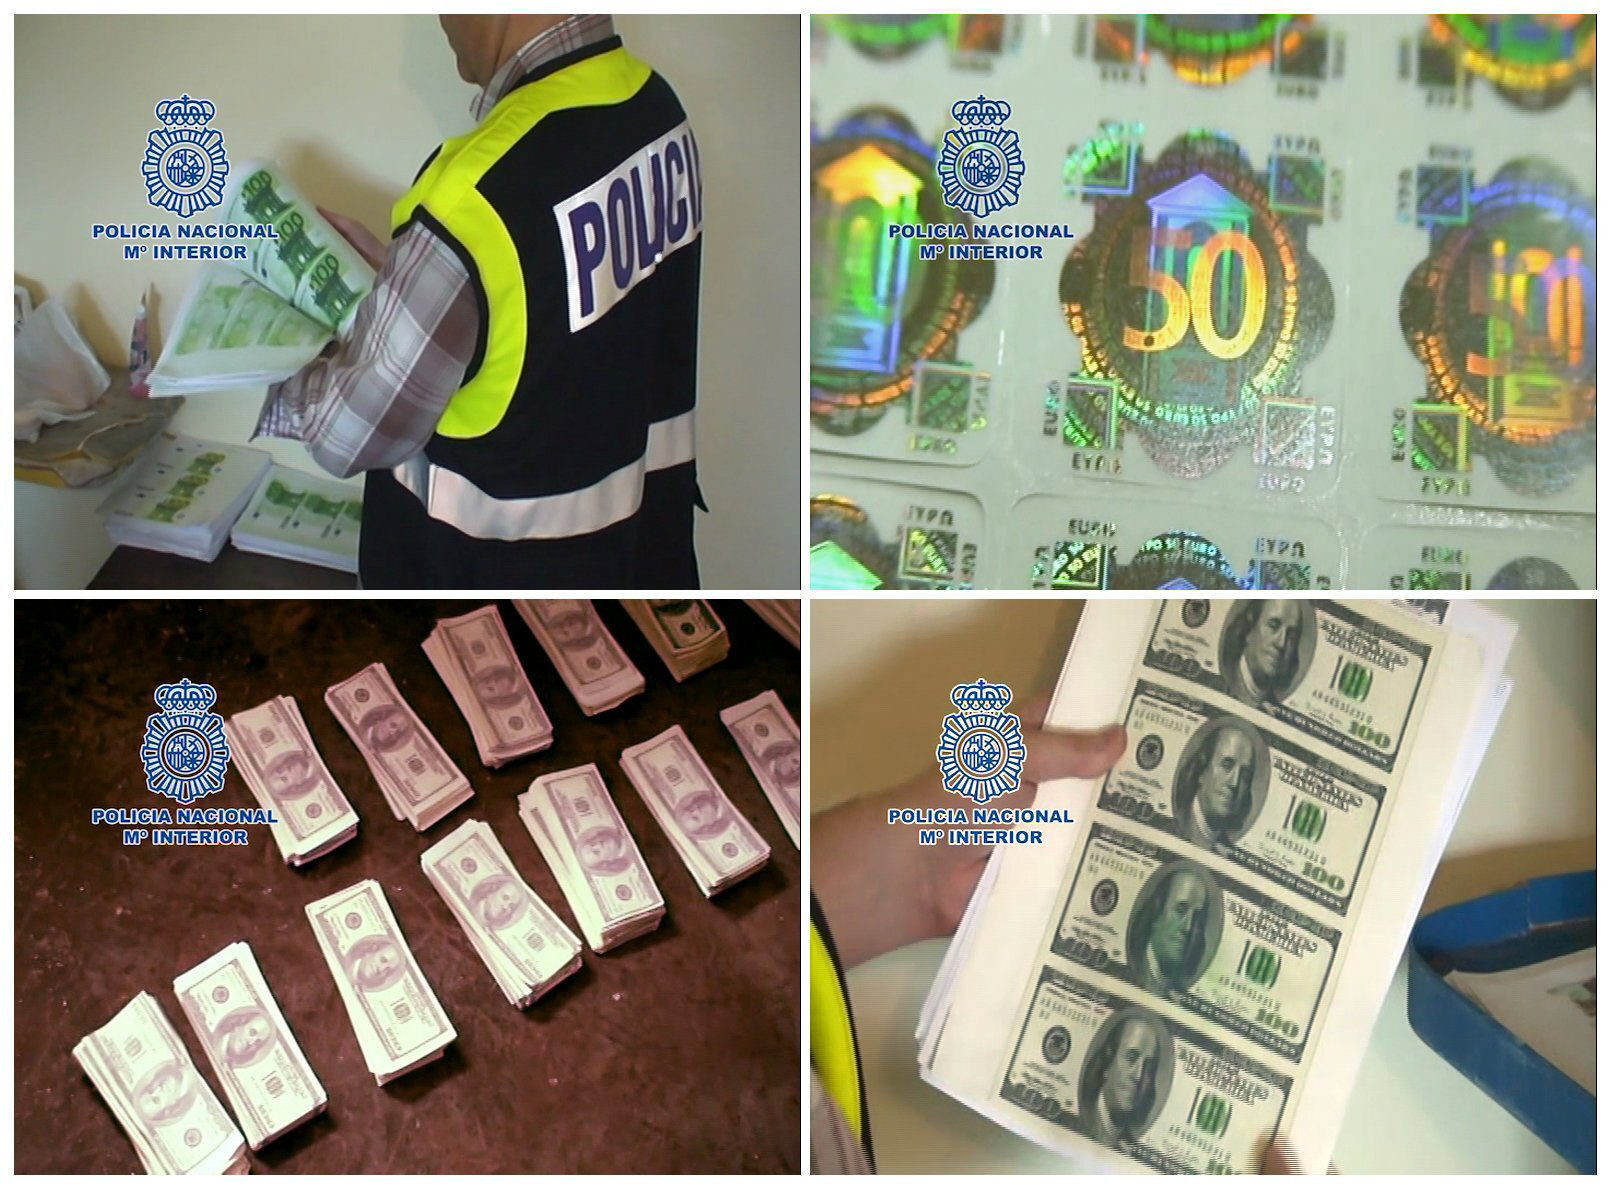 Policías españoles ayudan a cerrar un centro de billetes falsos en Bogotá